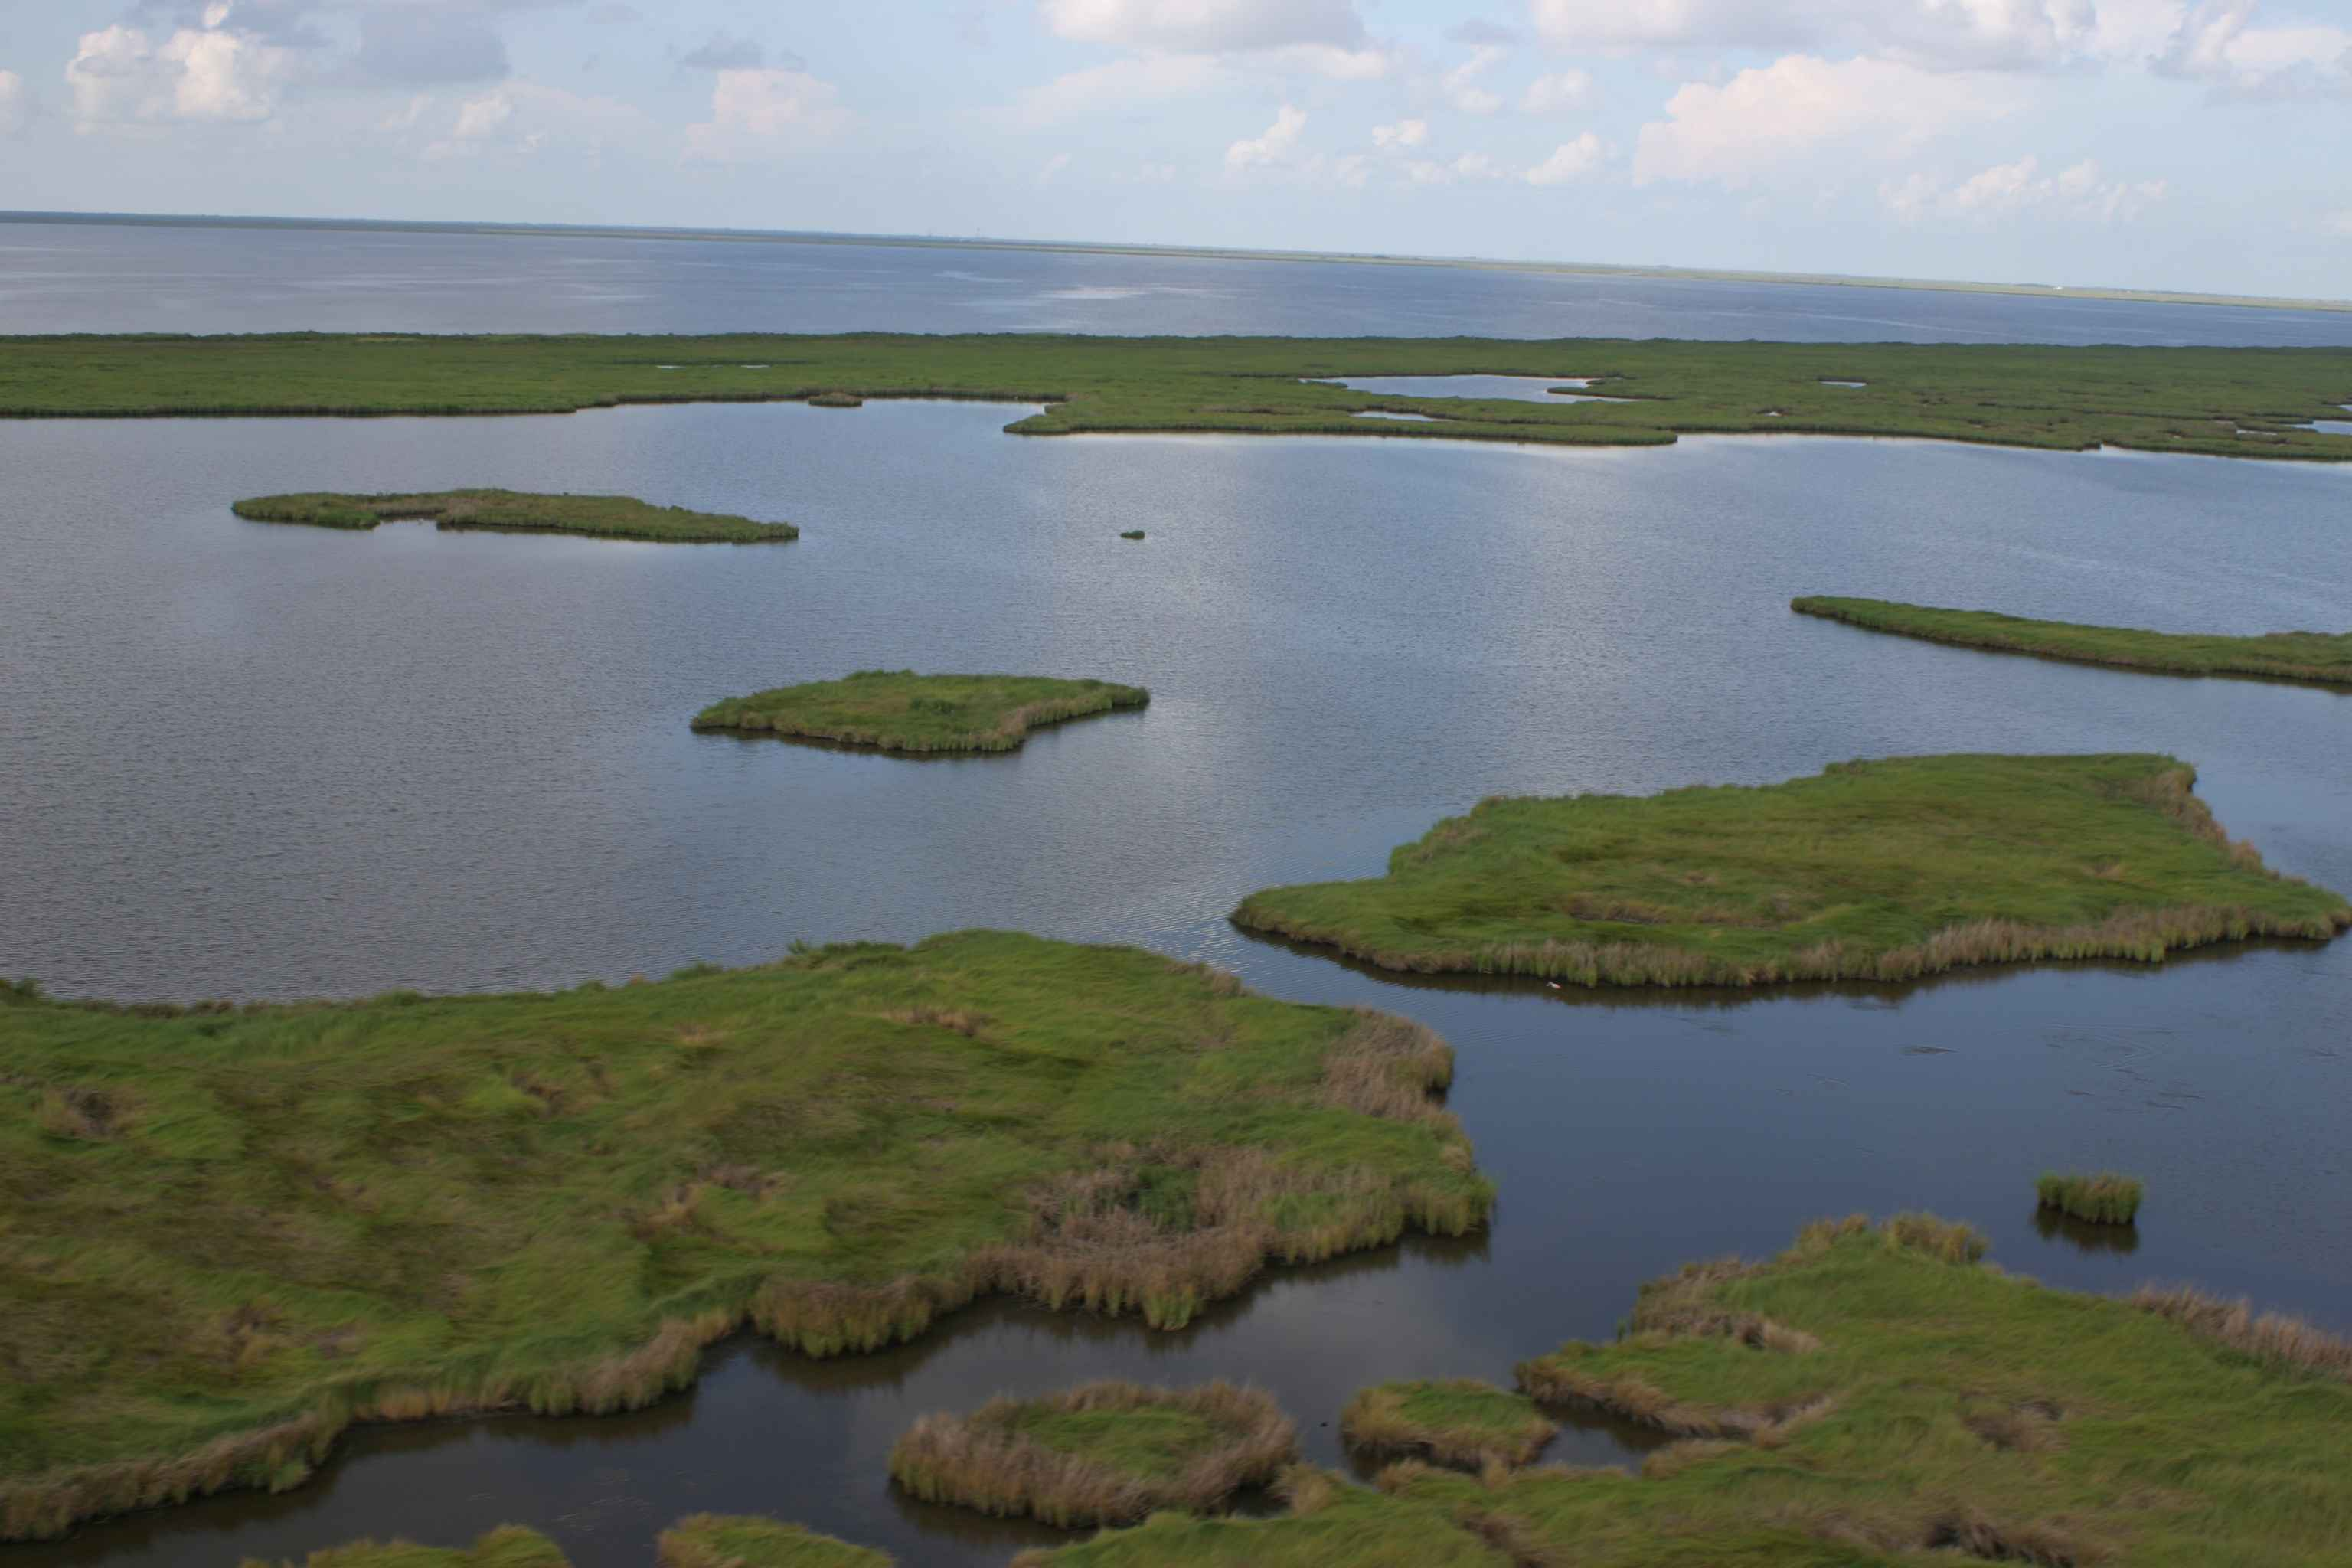 File Aerial View Of Marsh Jpg Wikimedia Commons